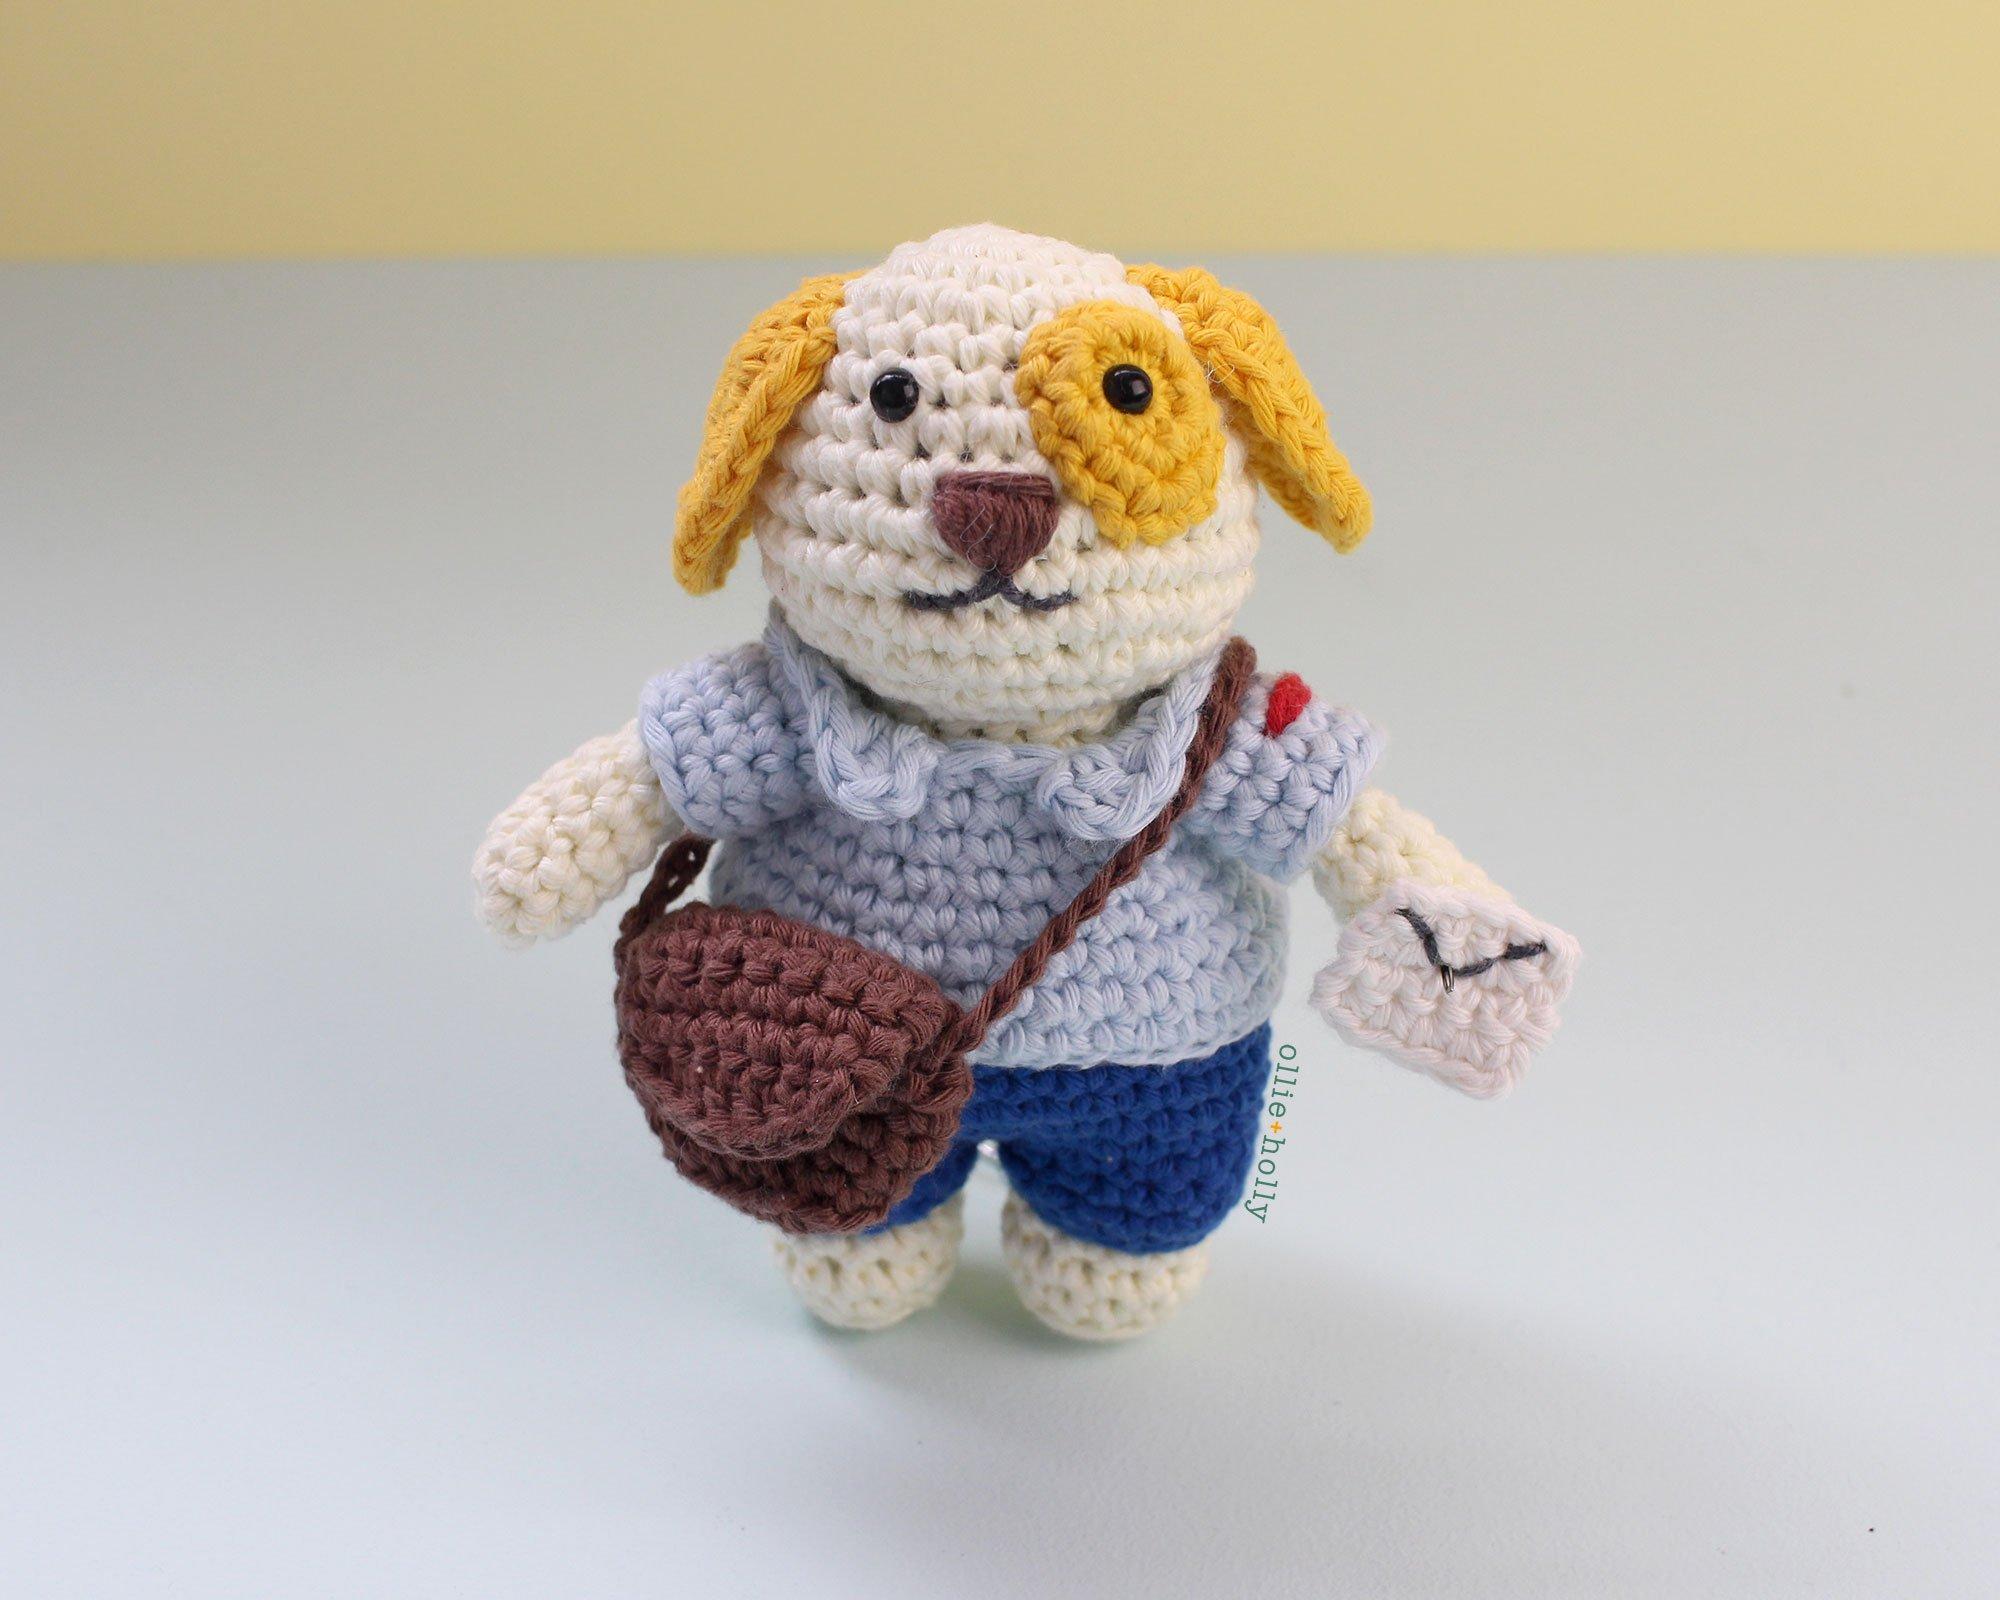 Free Postal Worker Puppy Stuffed Dog Amigurumi Crochet Pattern Step Complete Bag Closed